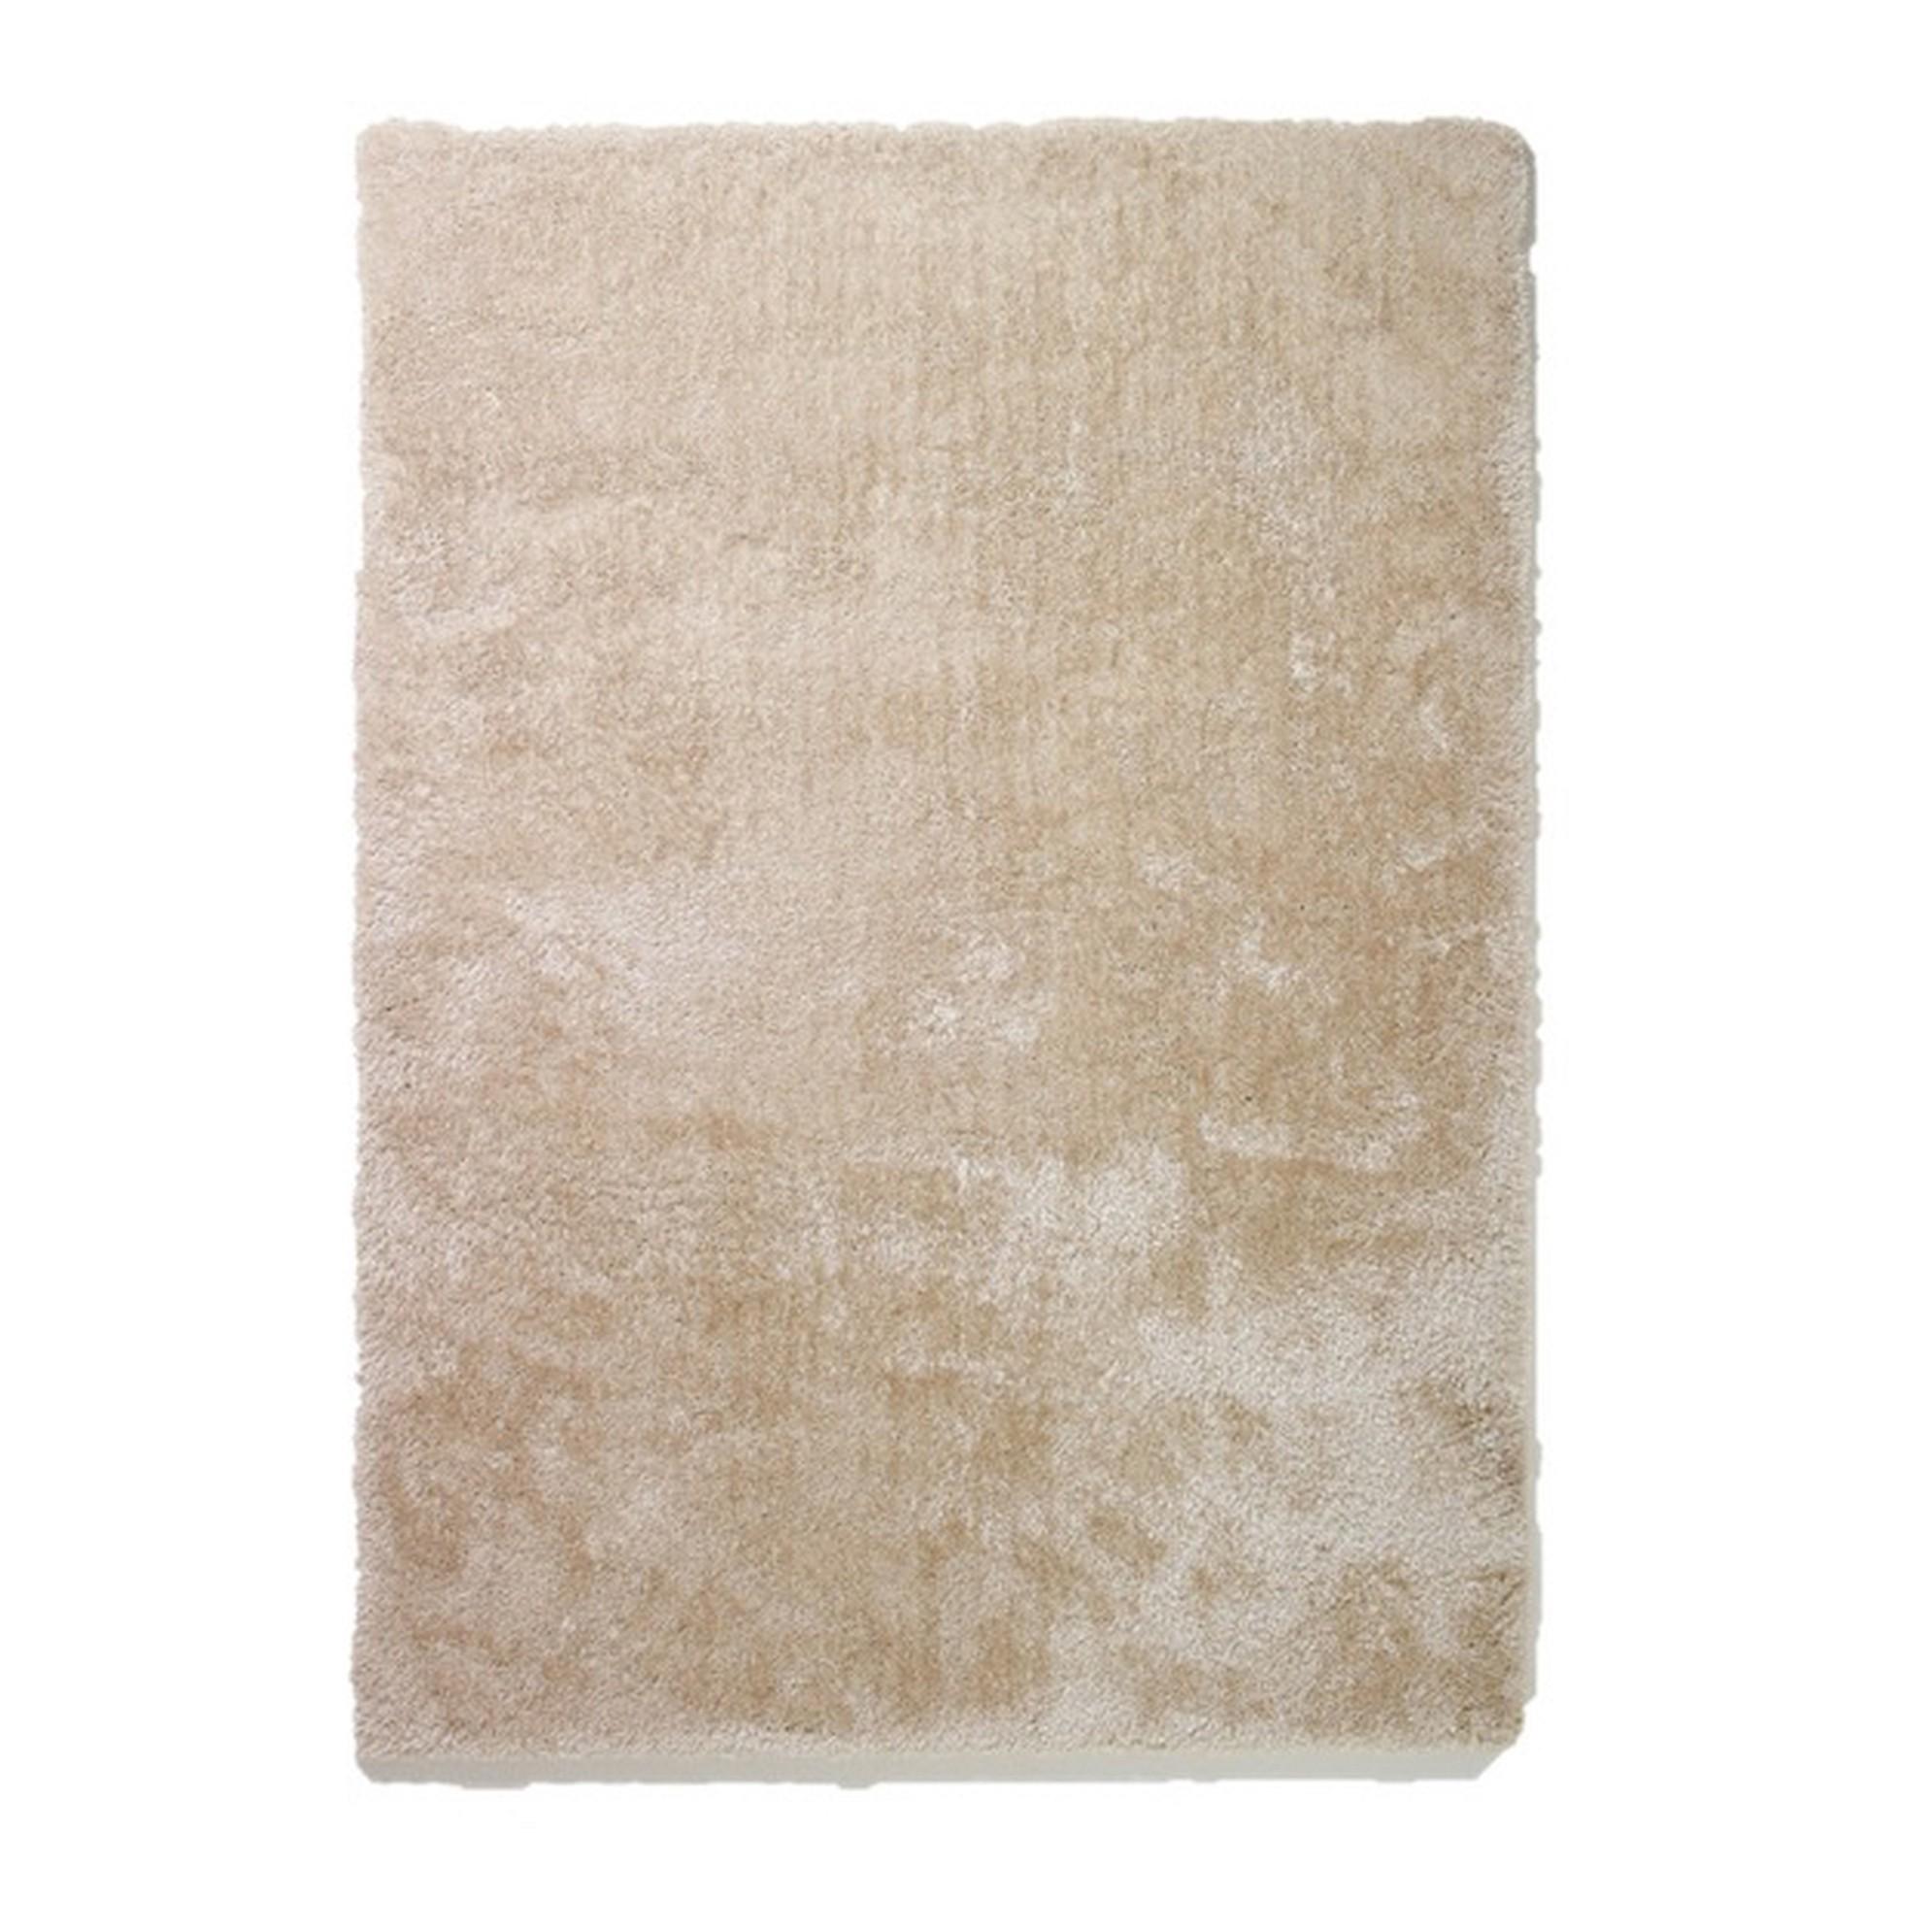 Teppich Pebble – Beige – 70 x 140 cm, Colourcourage bestellen